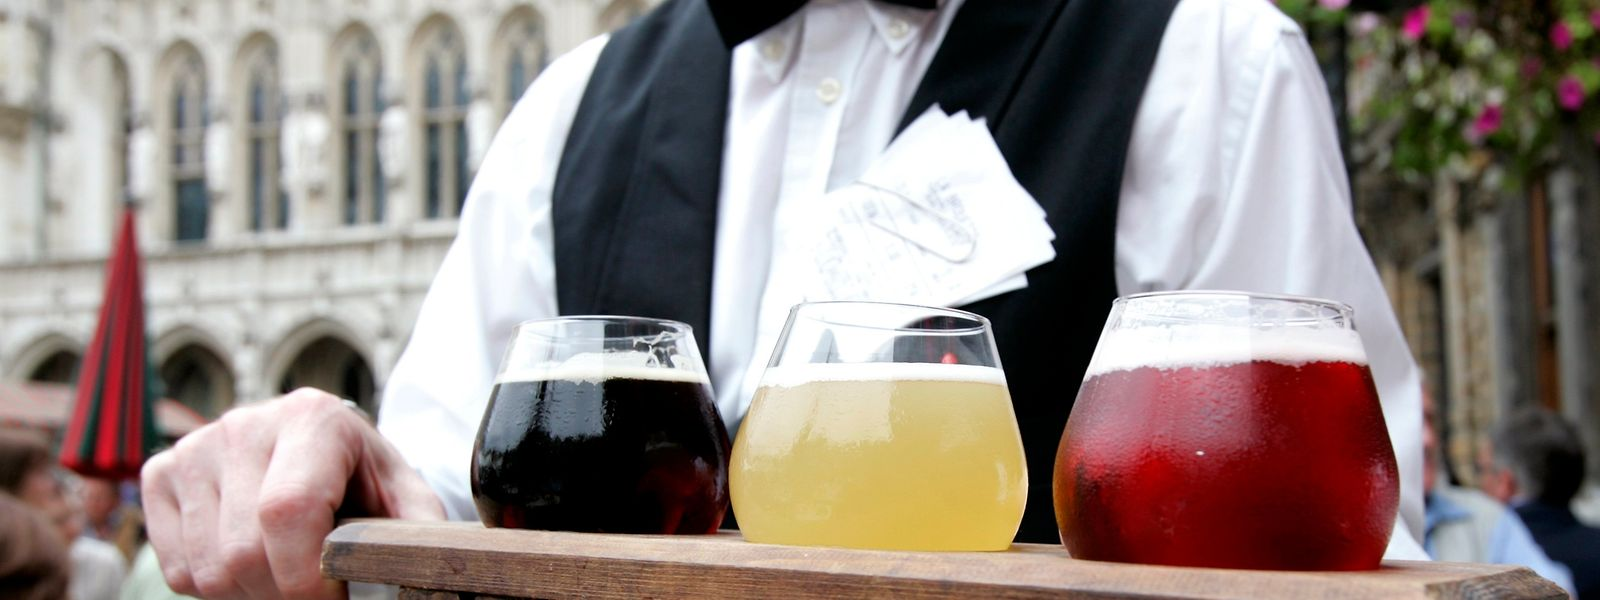 Belgisches Bier ist Kulturerbe - jetzt auch offiziell.